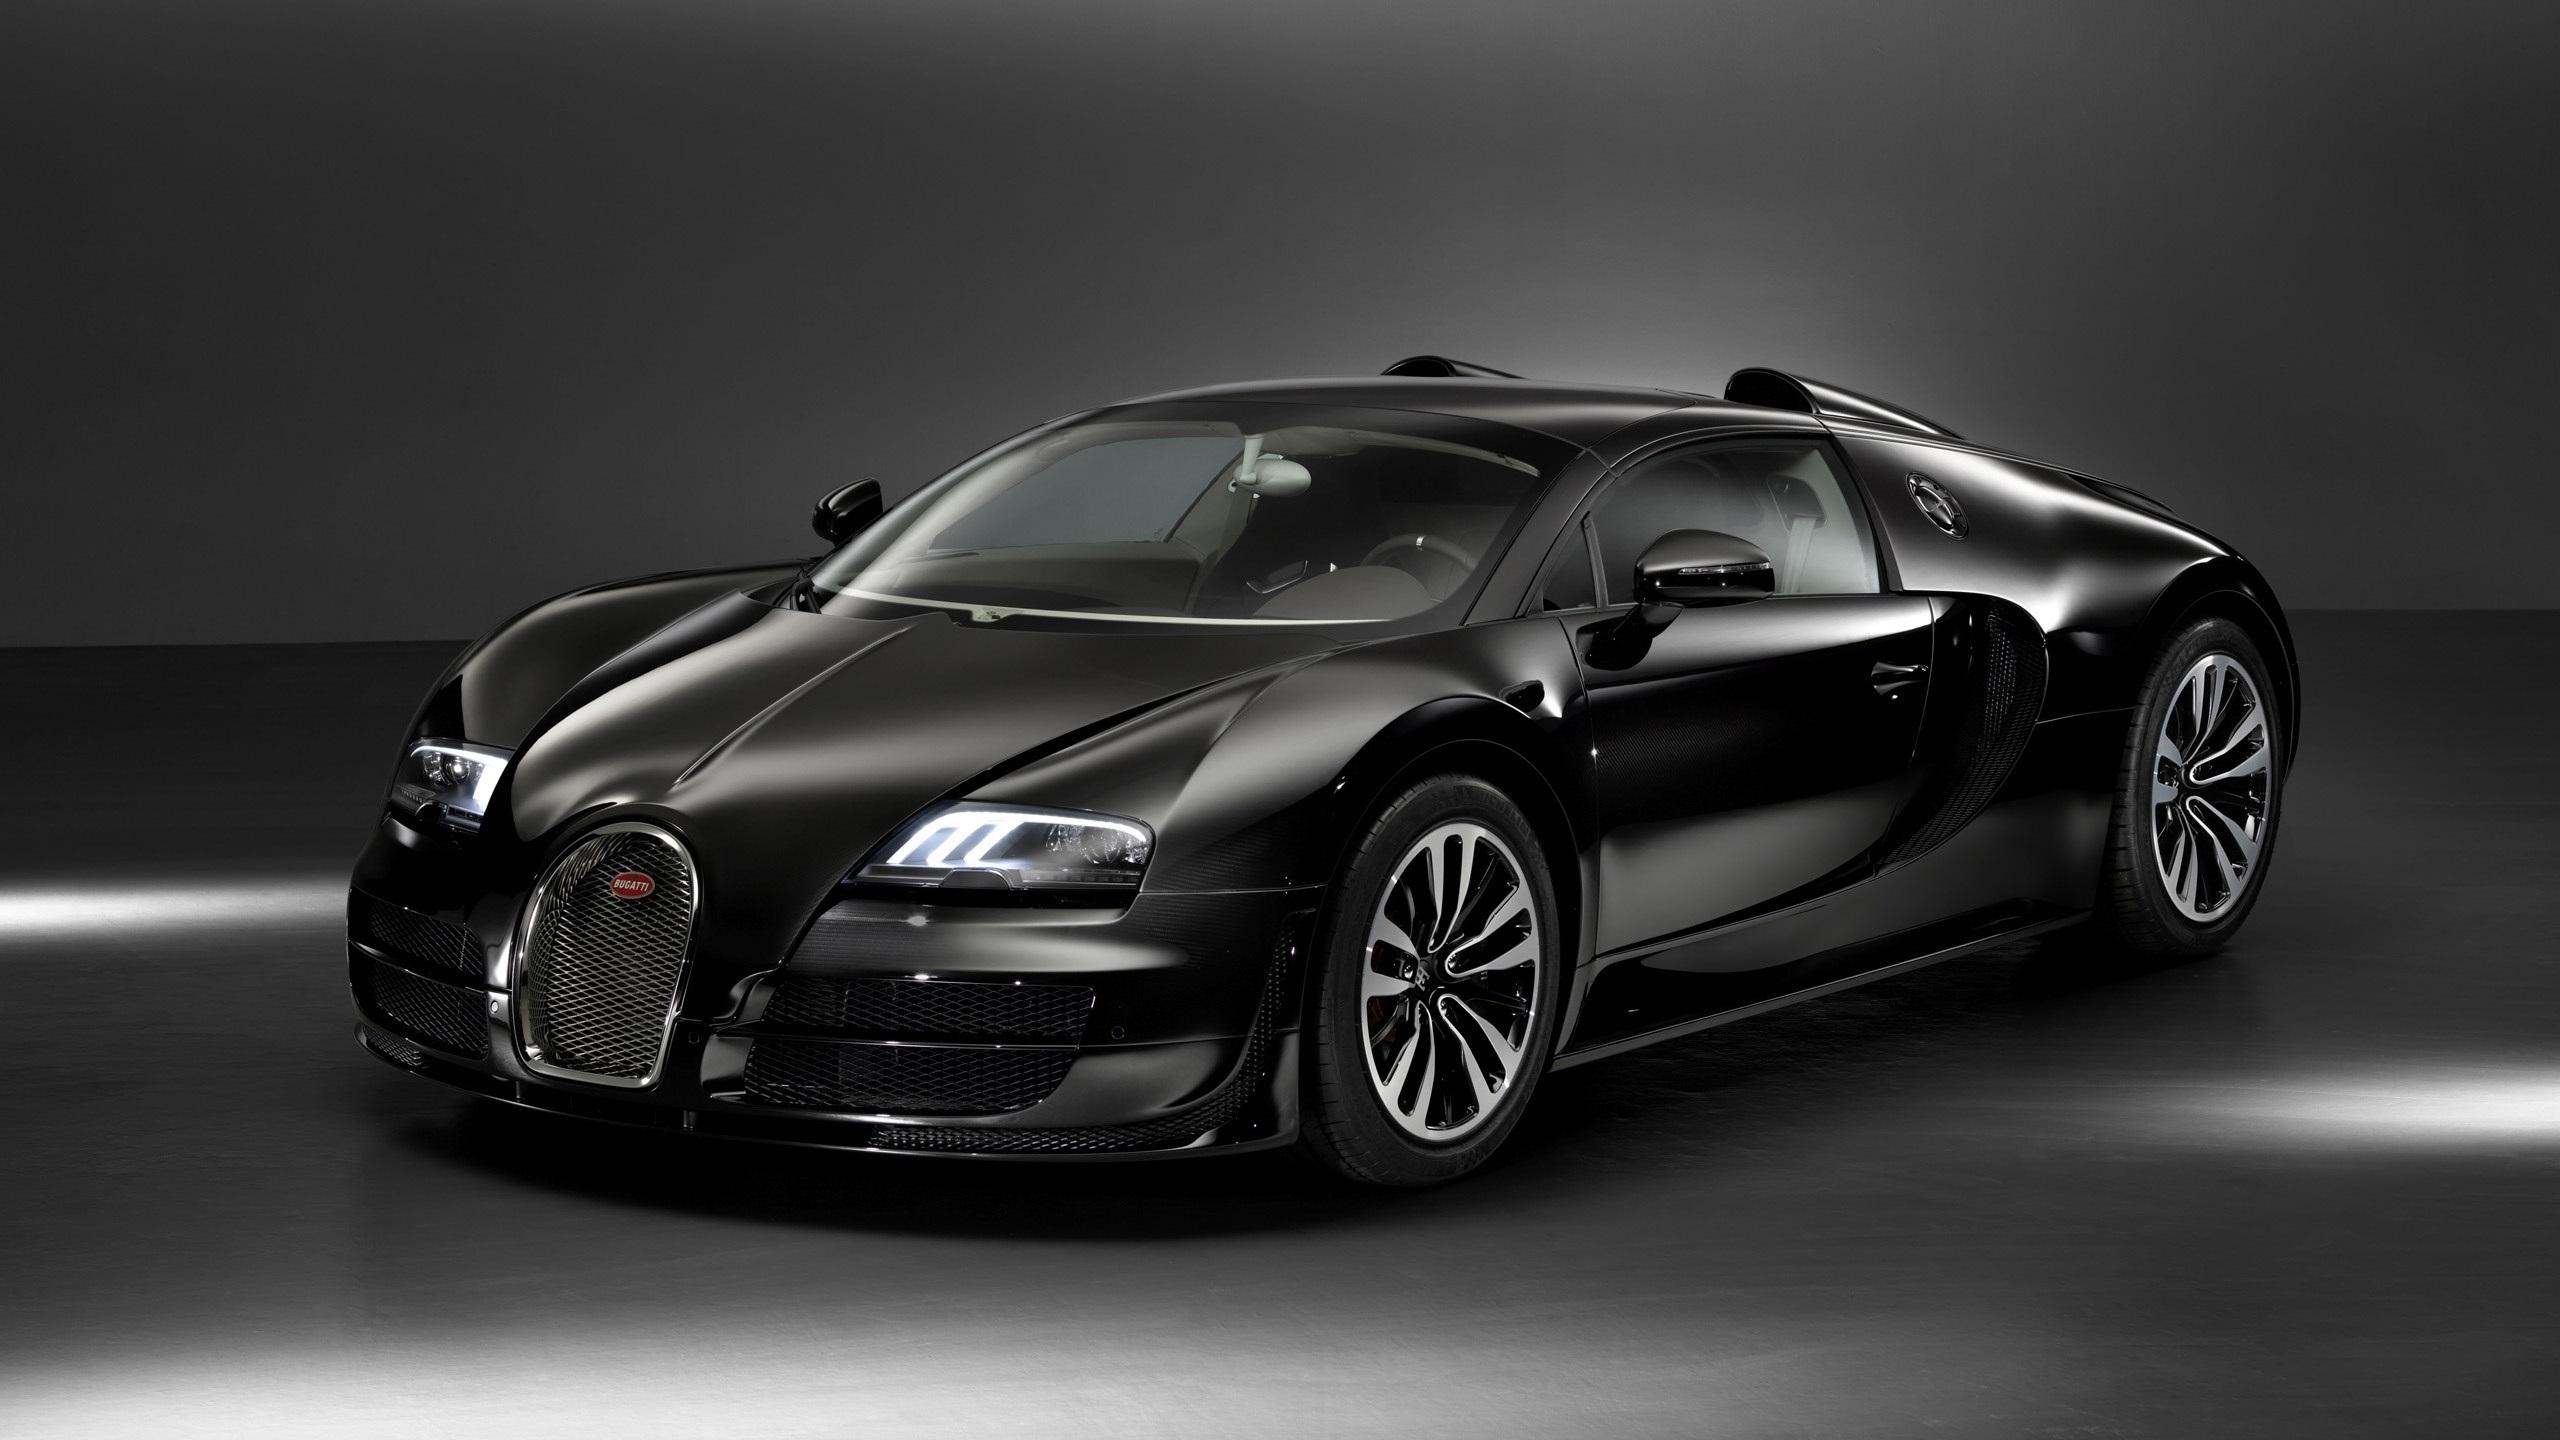 Wallpaper Bugatti Veyron Black Car 2560x1600 Hd Picture Image